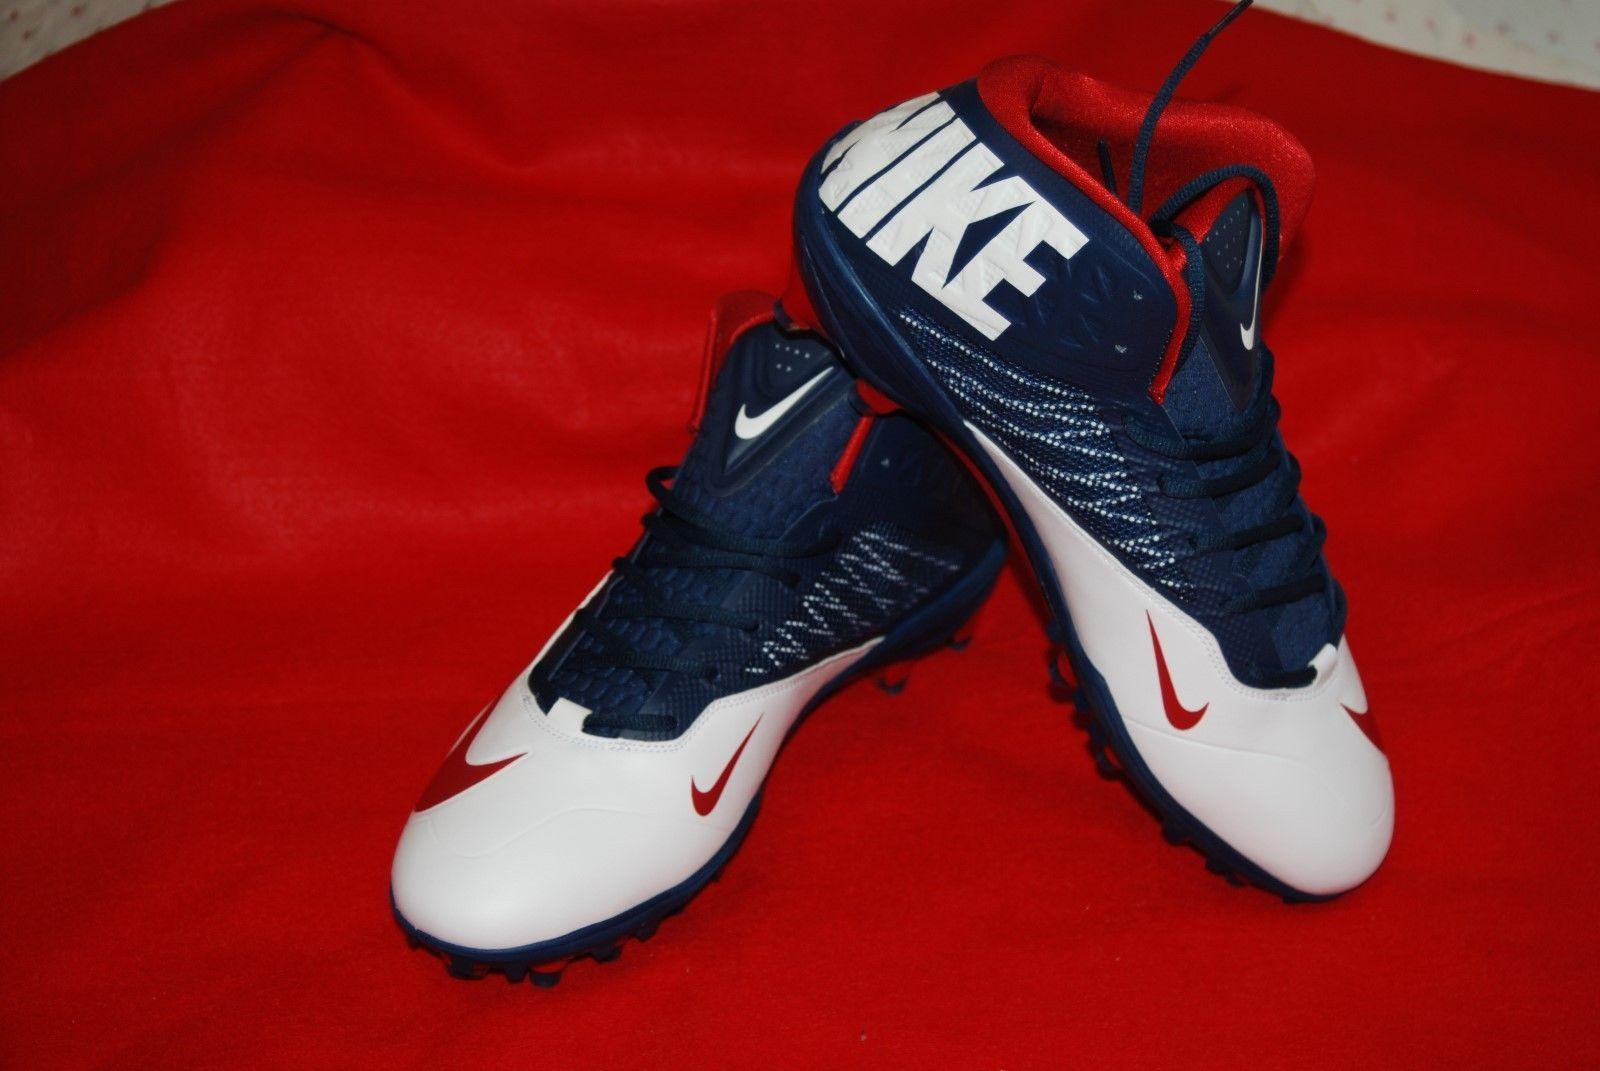 94e830168c6 Nike Zoom Code Elite TD Football Cleat 620499-413 Red White Blue Size 16  NWOB